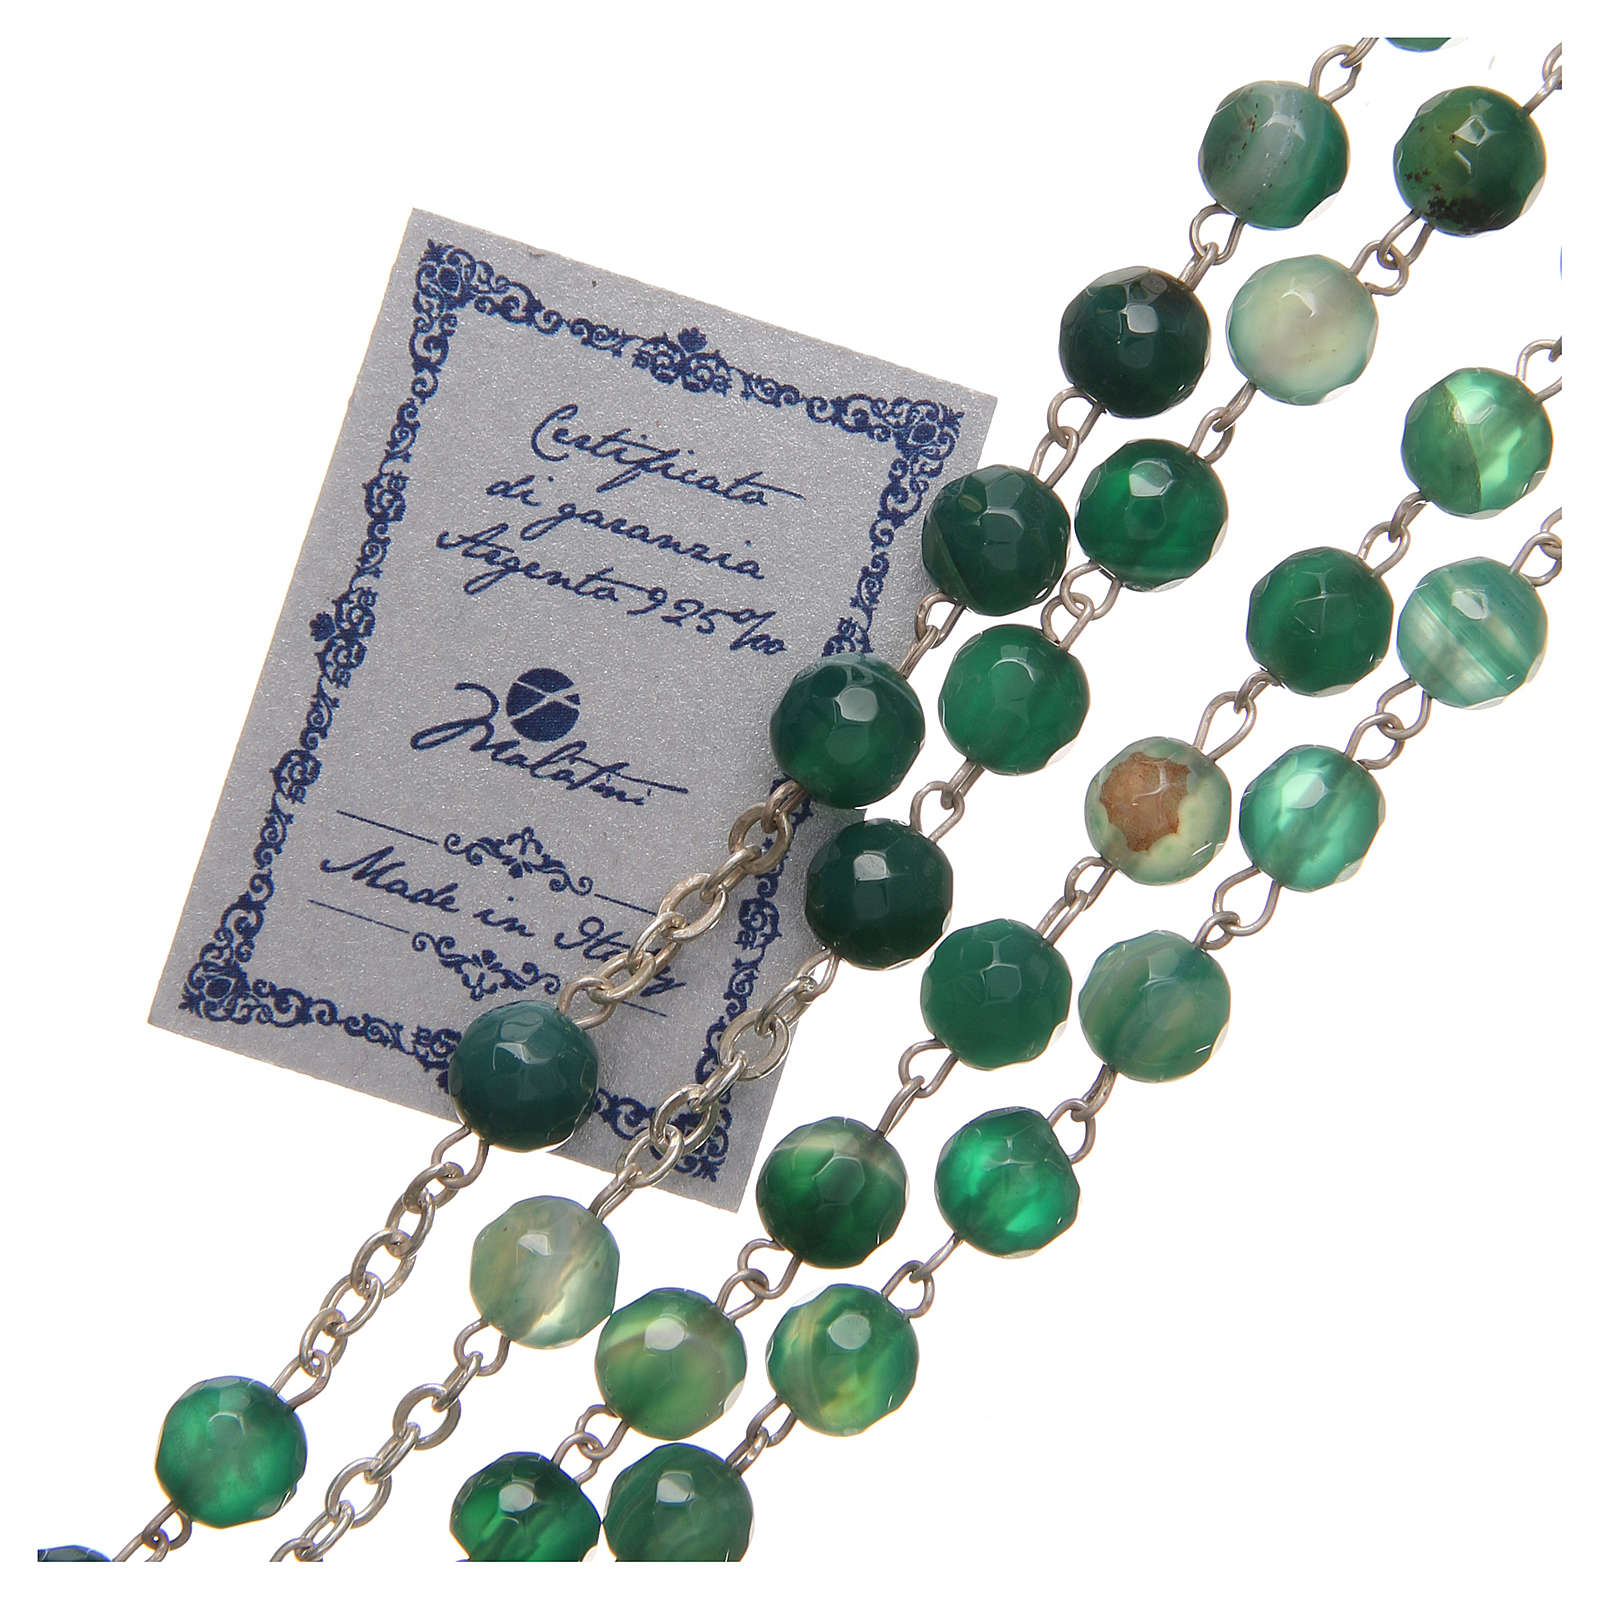 Rosario agata brasiliana Giubileo 6 mm argento 925 verde 4